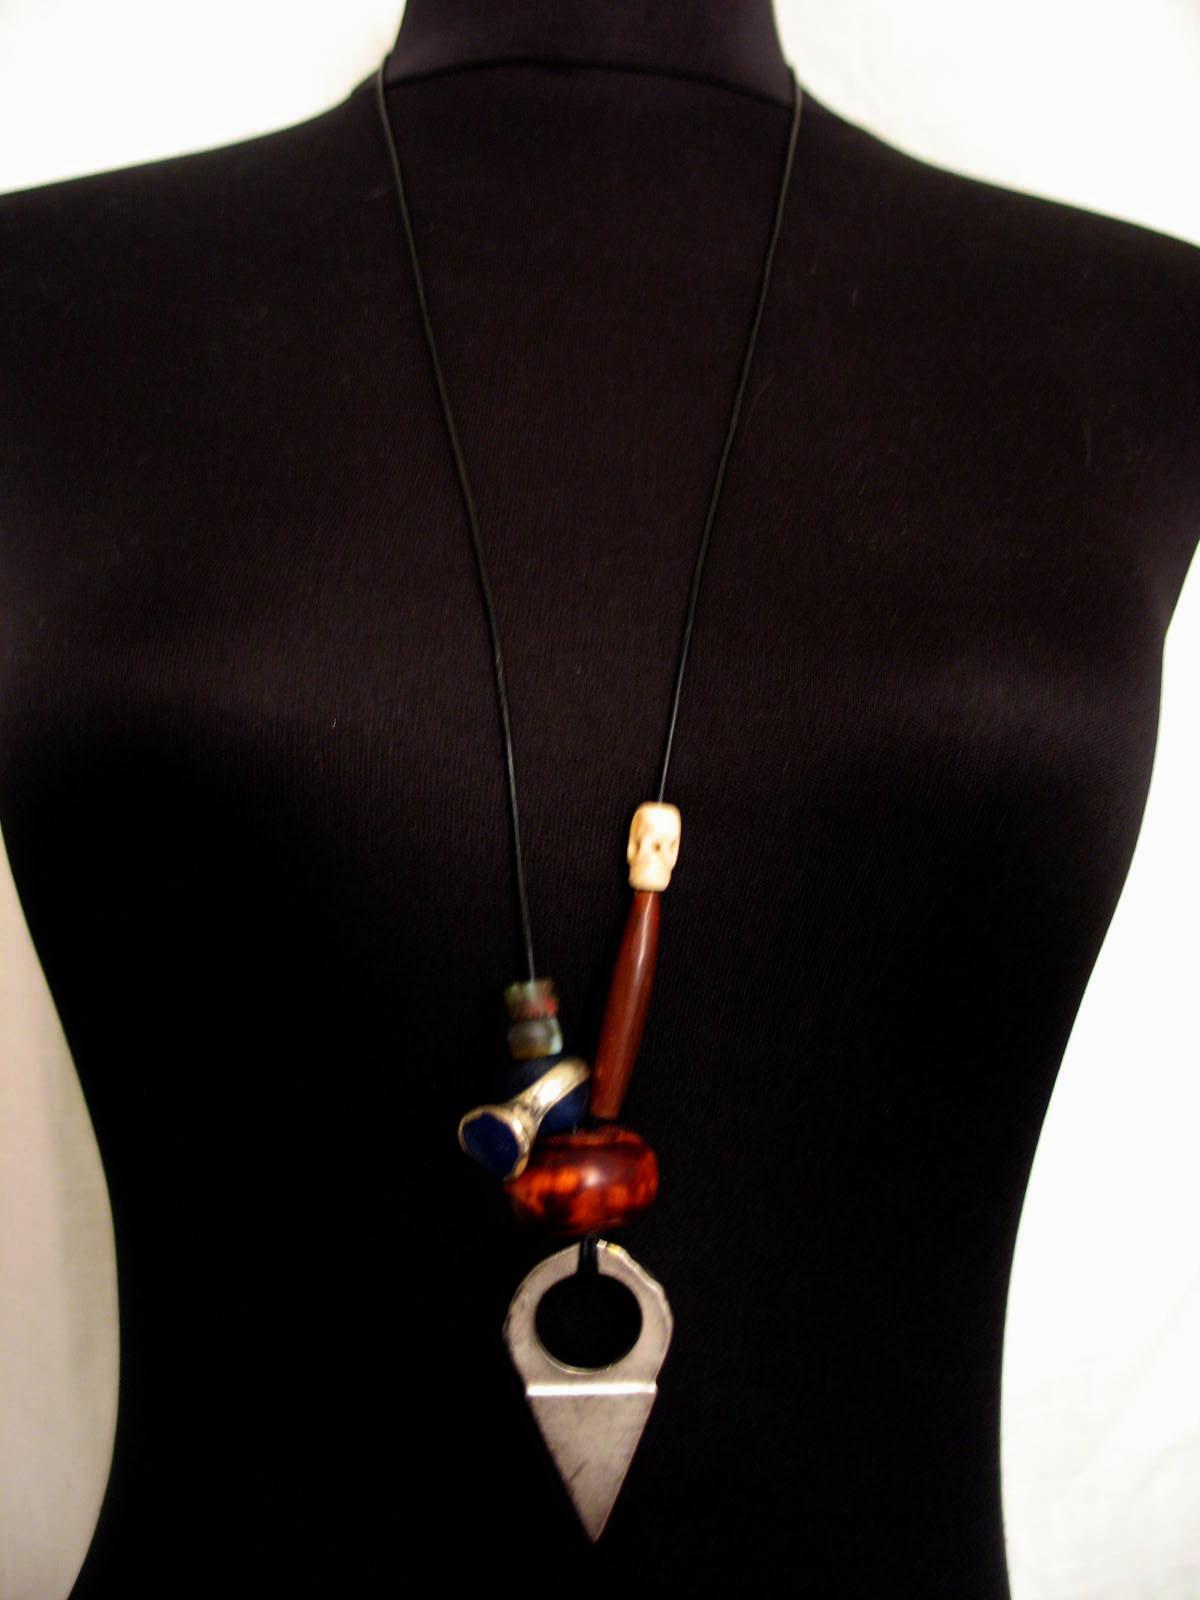 Gris gris number 8 pendant amulet necklace sunny chapman design gris gris number 8 pendant amulet necklace thumbnail 1 aloadofball Choice Image